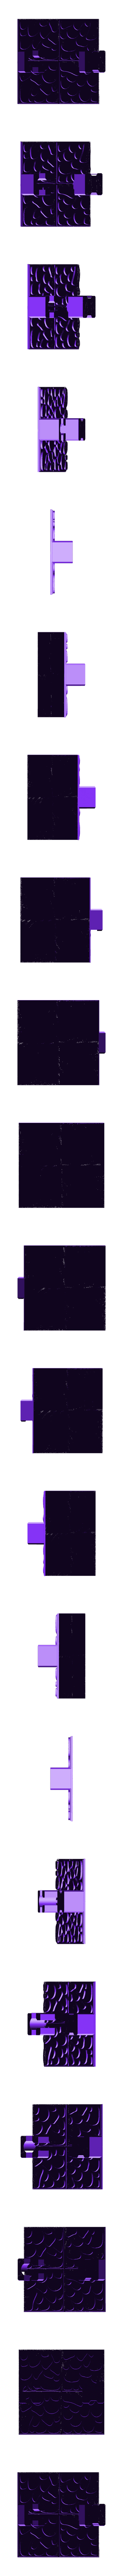 Finalized_Door_Frame.stl Download STL file GeneriTiles - Tabletop RPG Tileset • 3D printable object, daandruff